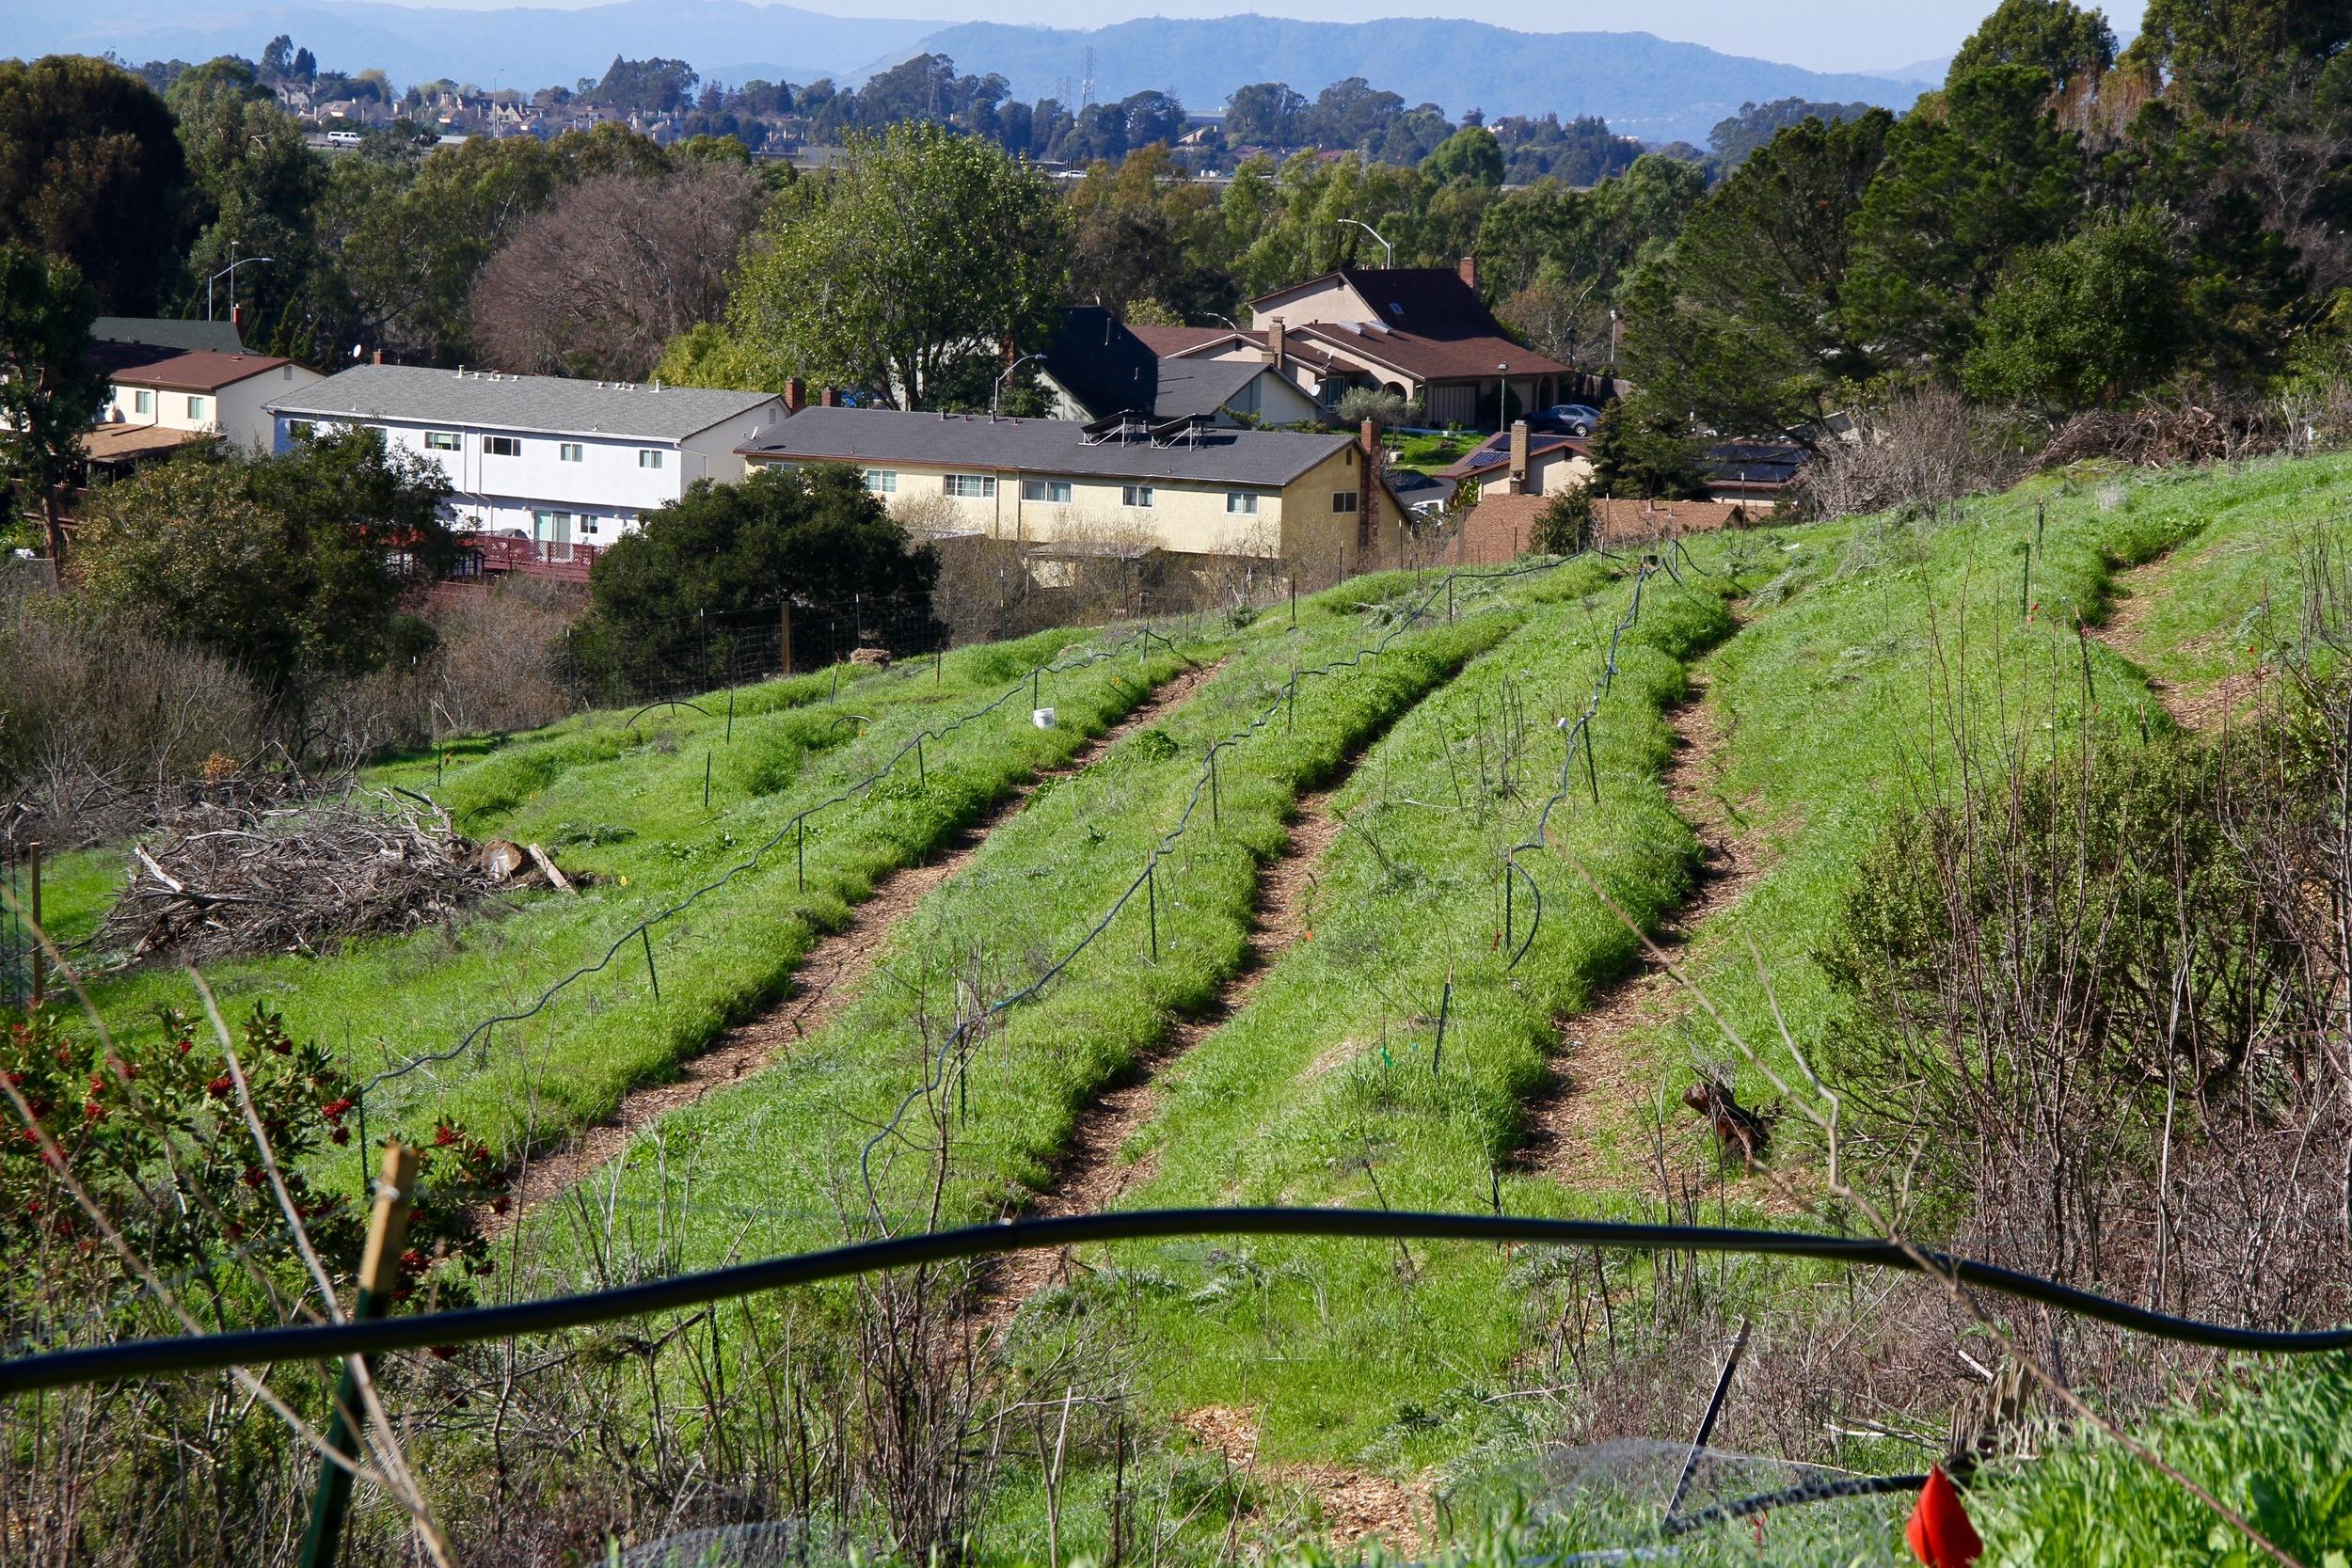 Farm Life image asset